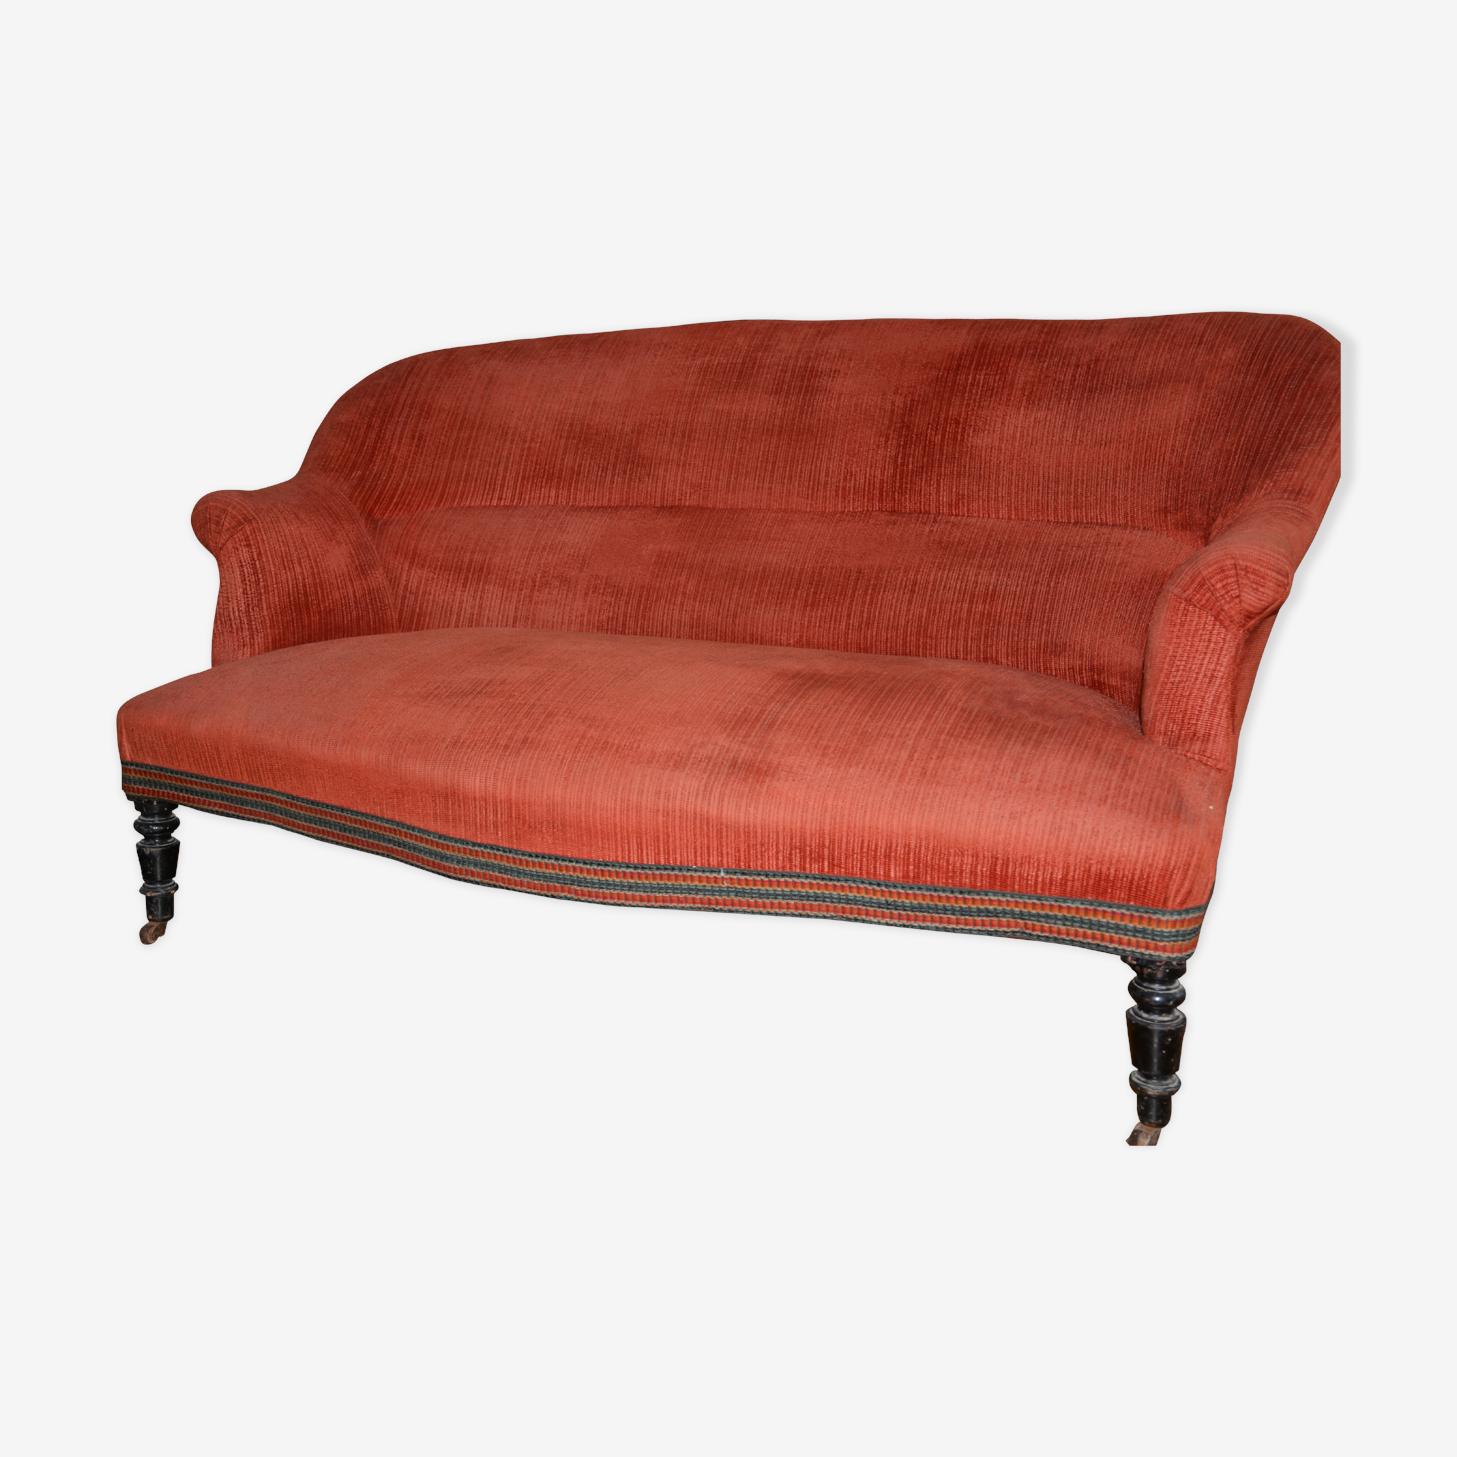 Toad sofa